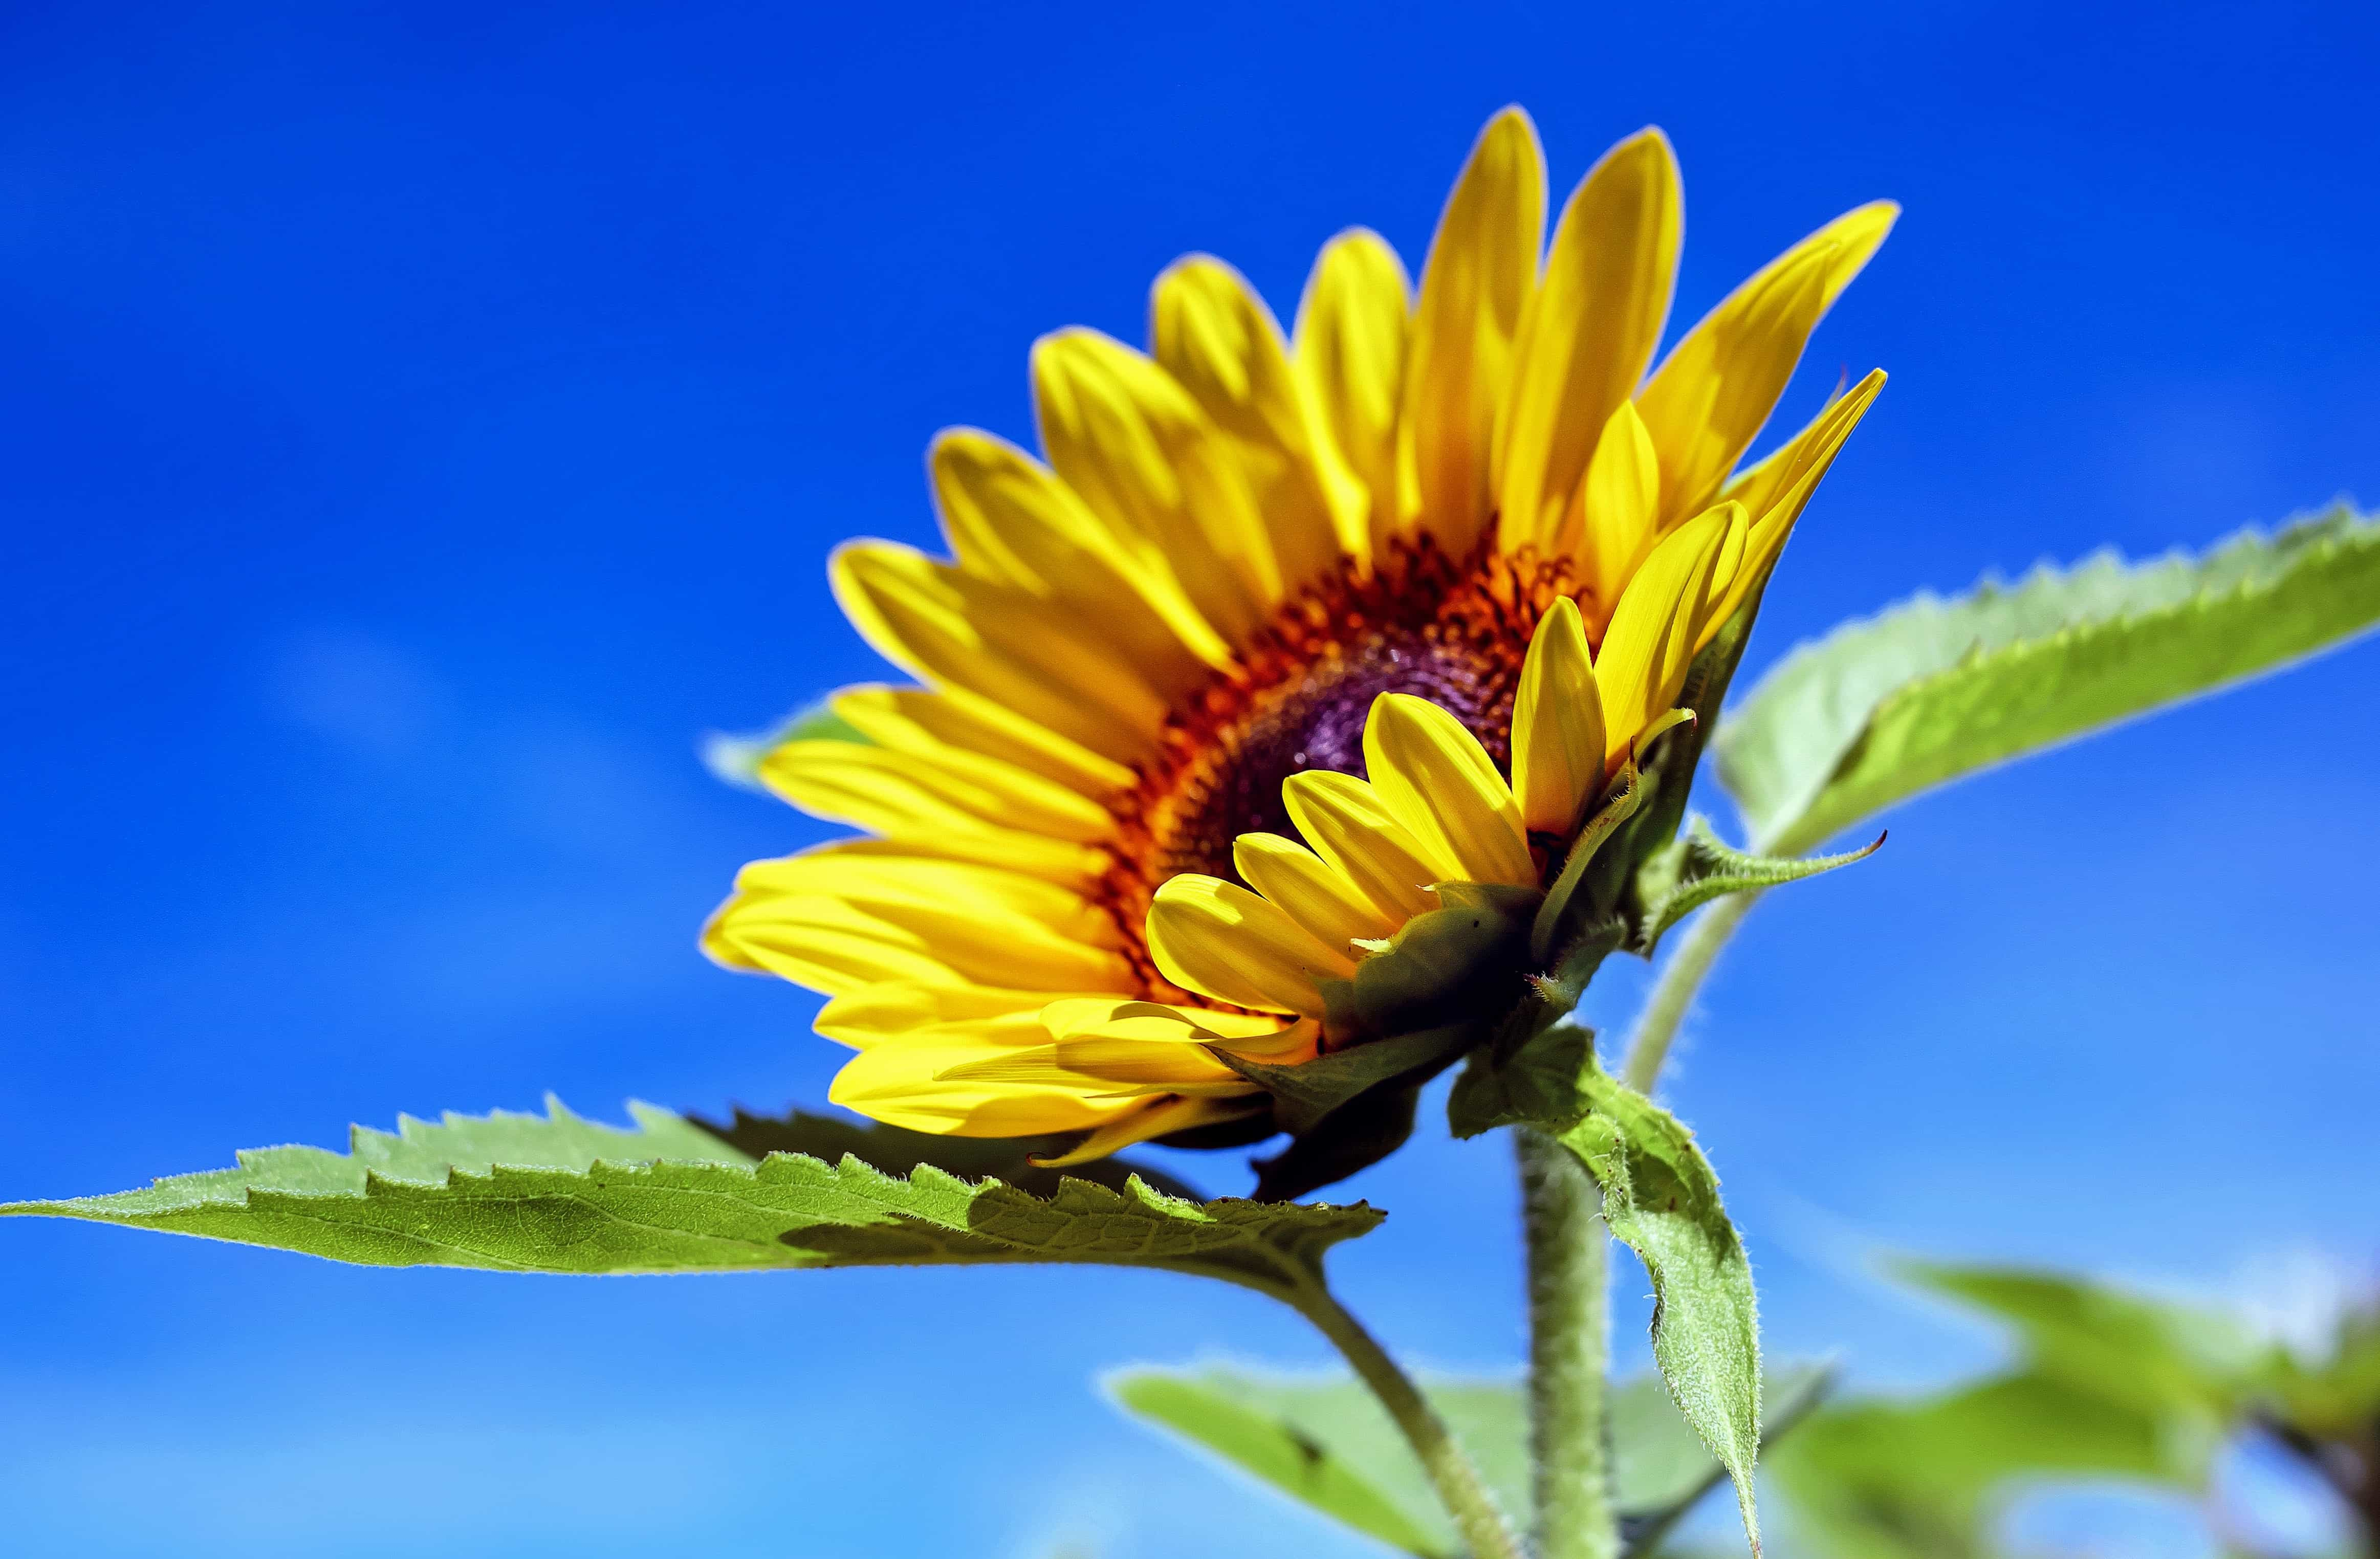 kostenlose bild sommer blatt flora natur blume sonnenblume bl tenblatt pflanze. Black Bedroom Furniture Sets. Home Design Ideas